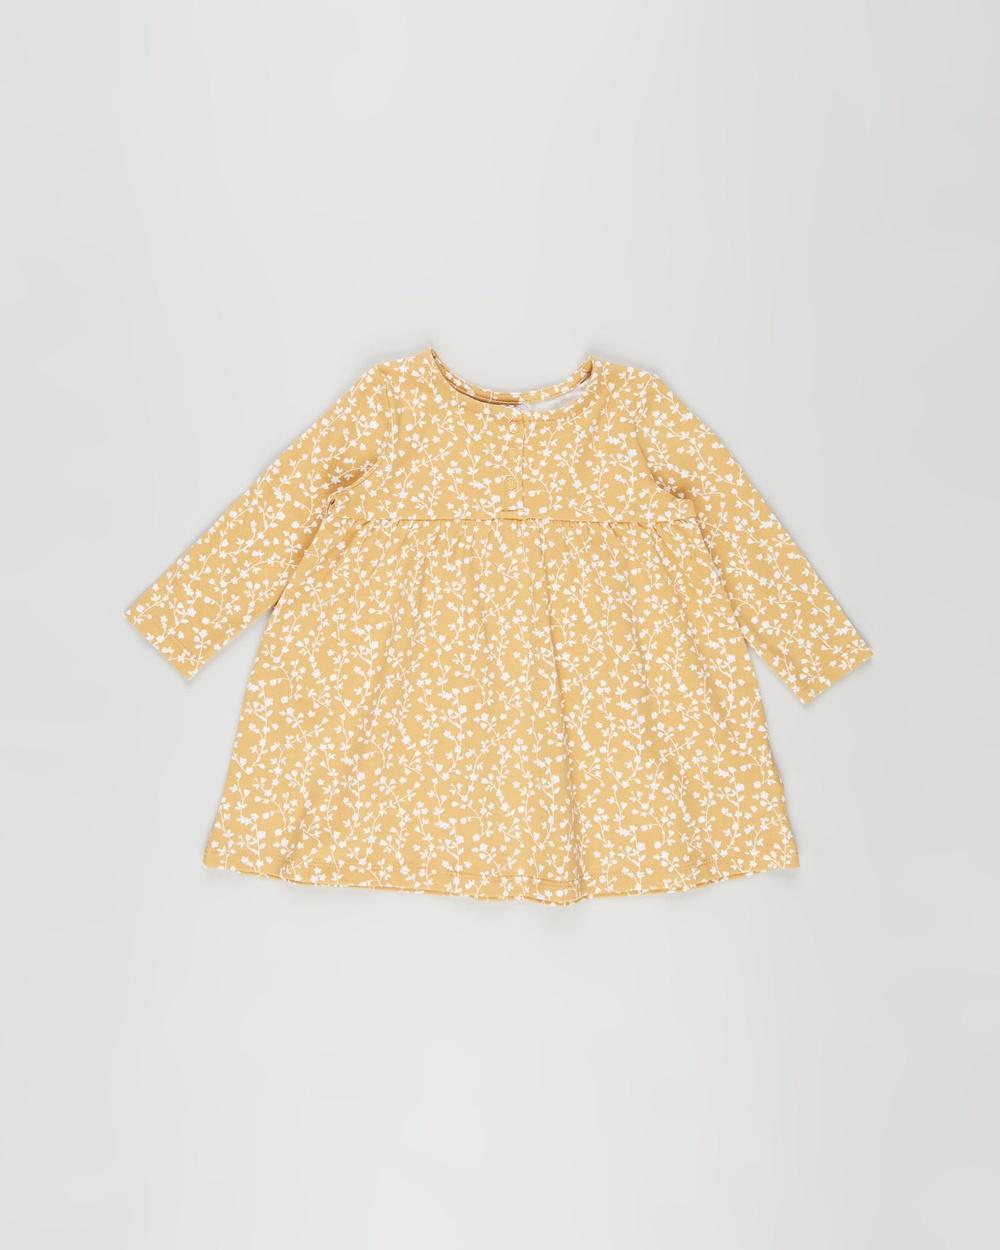 Cotton On Baby Molly Long Sleeve Dress Babies Printed Dresses Vintage Honey & Vanilla Sierra Floral Australia